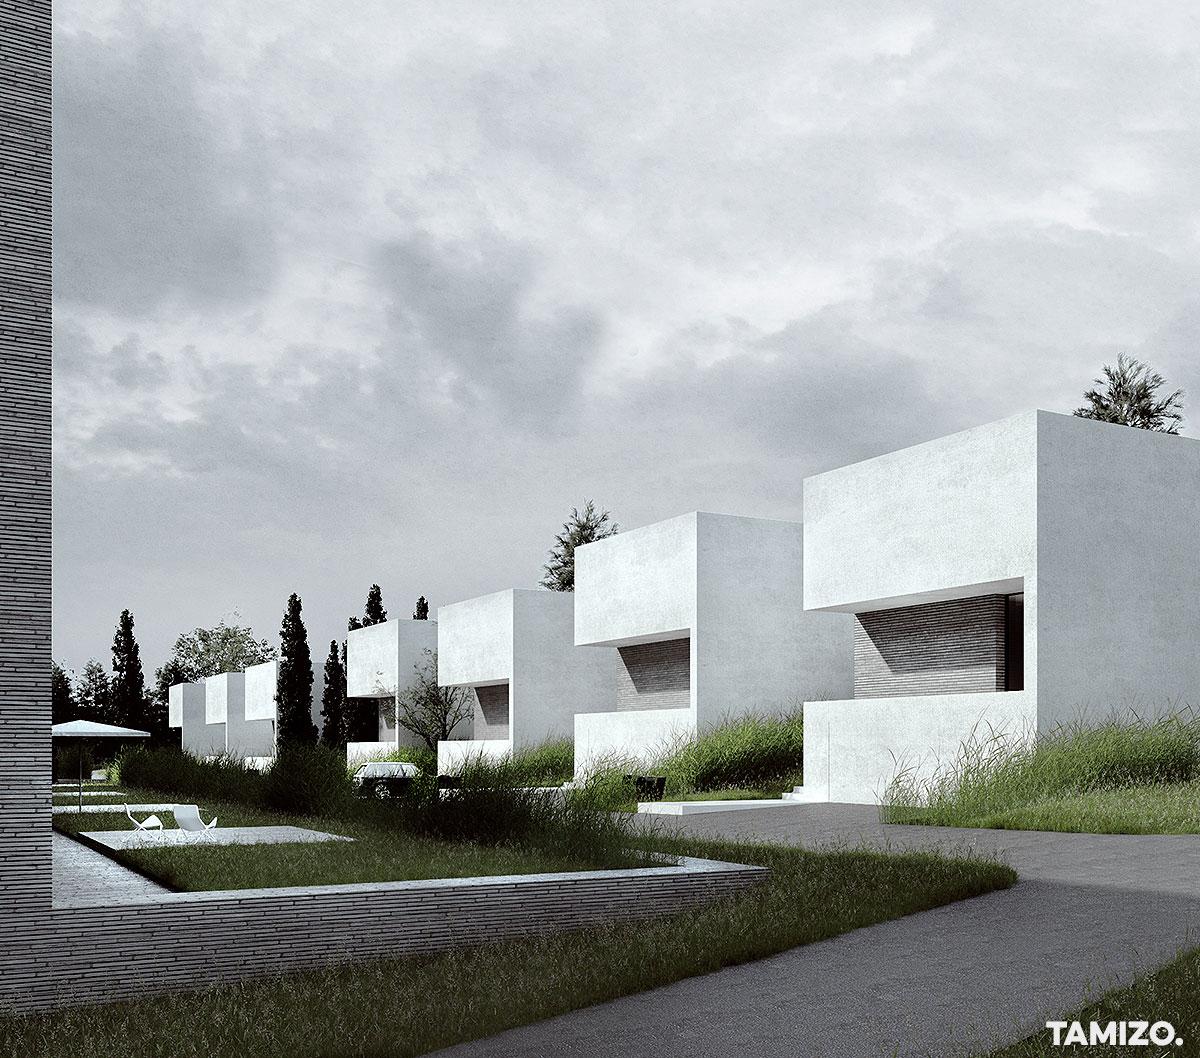 A061_tamizo_architects_competition_tbilisi_georgia_multifamily_houseing_realestate_12